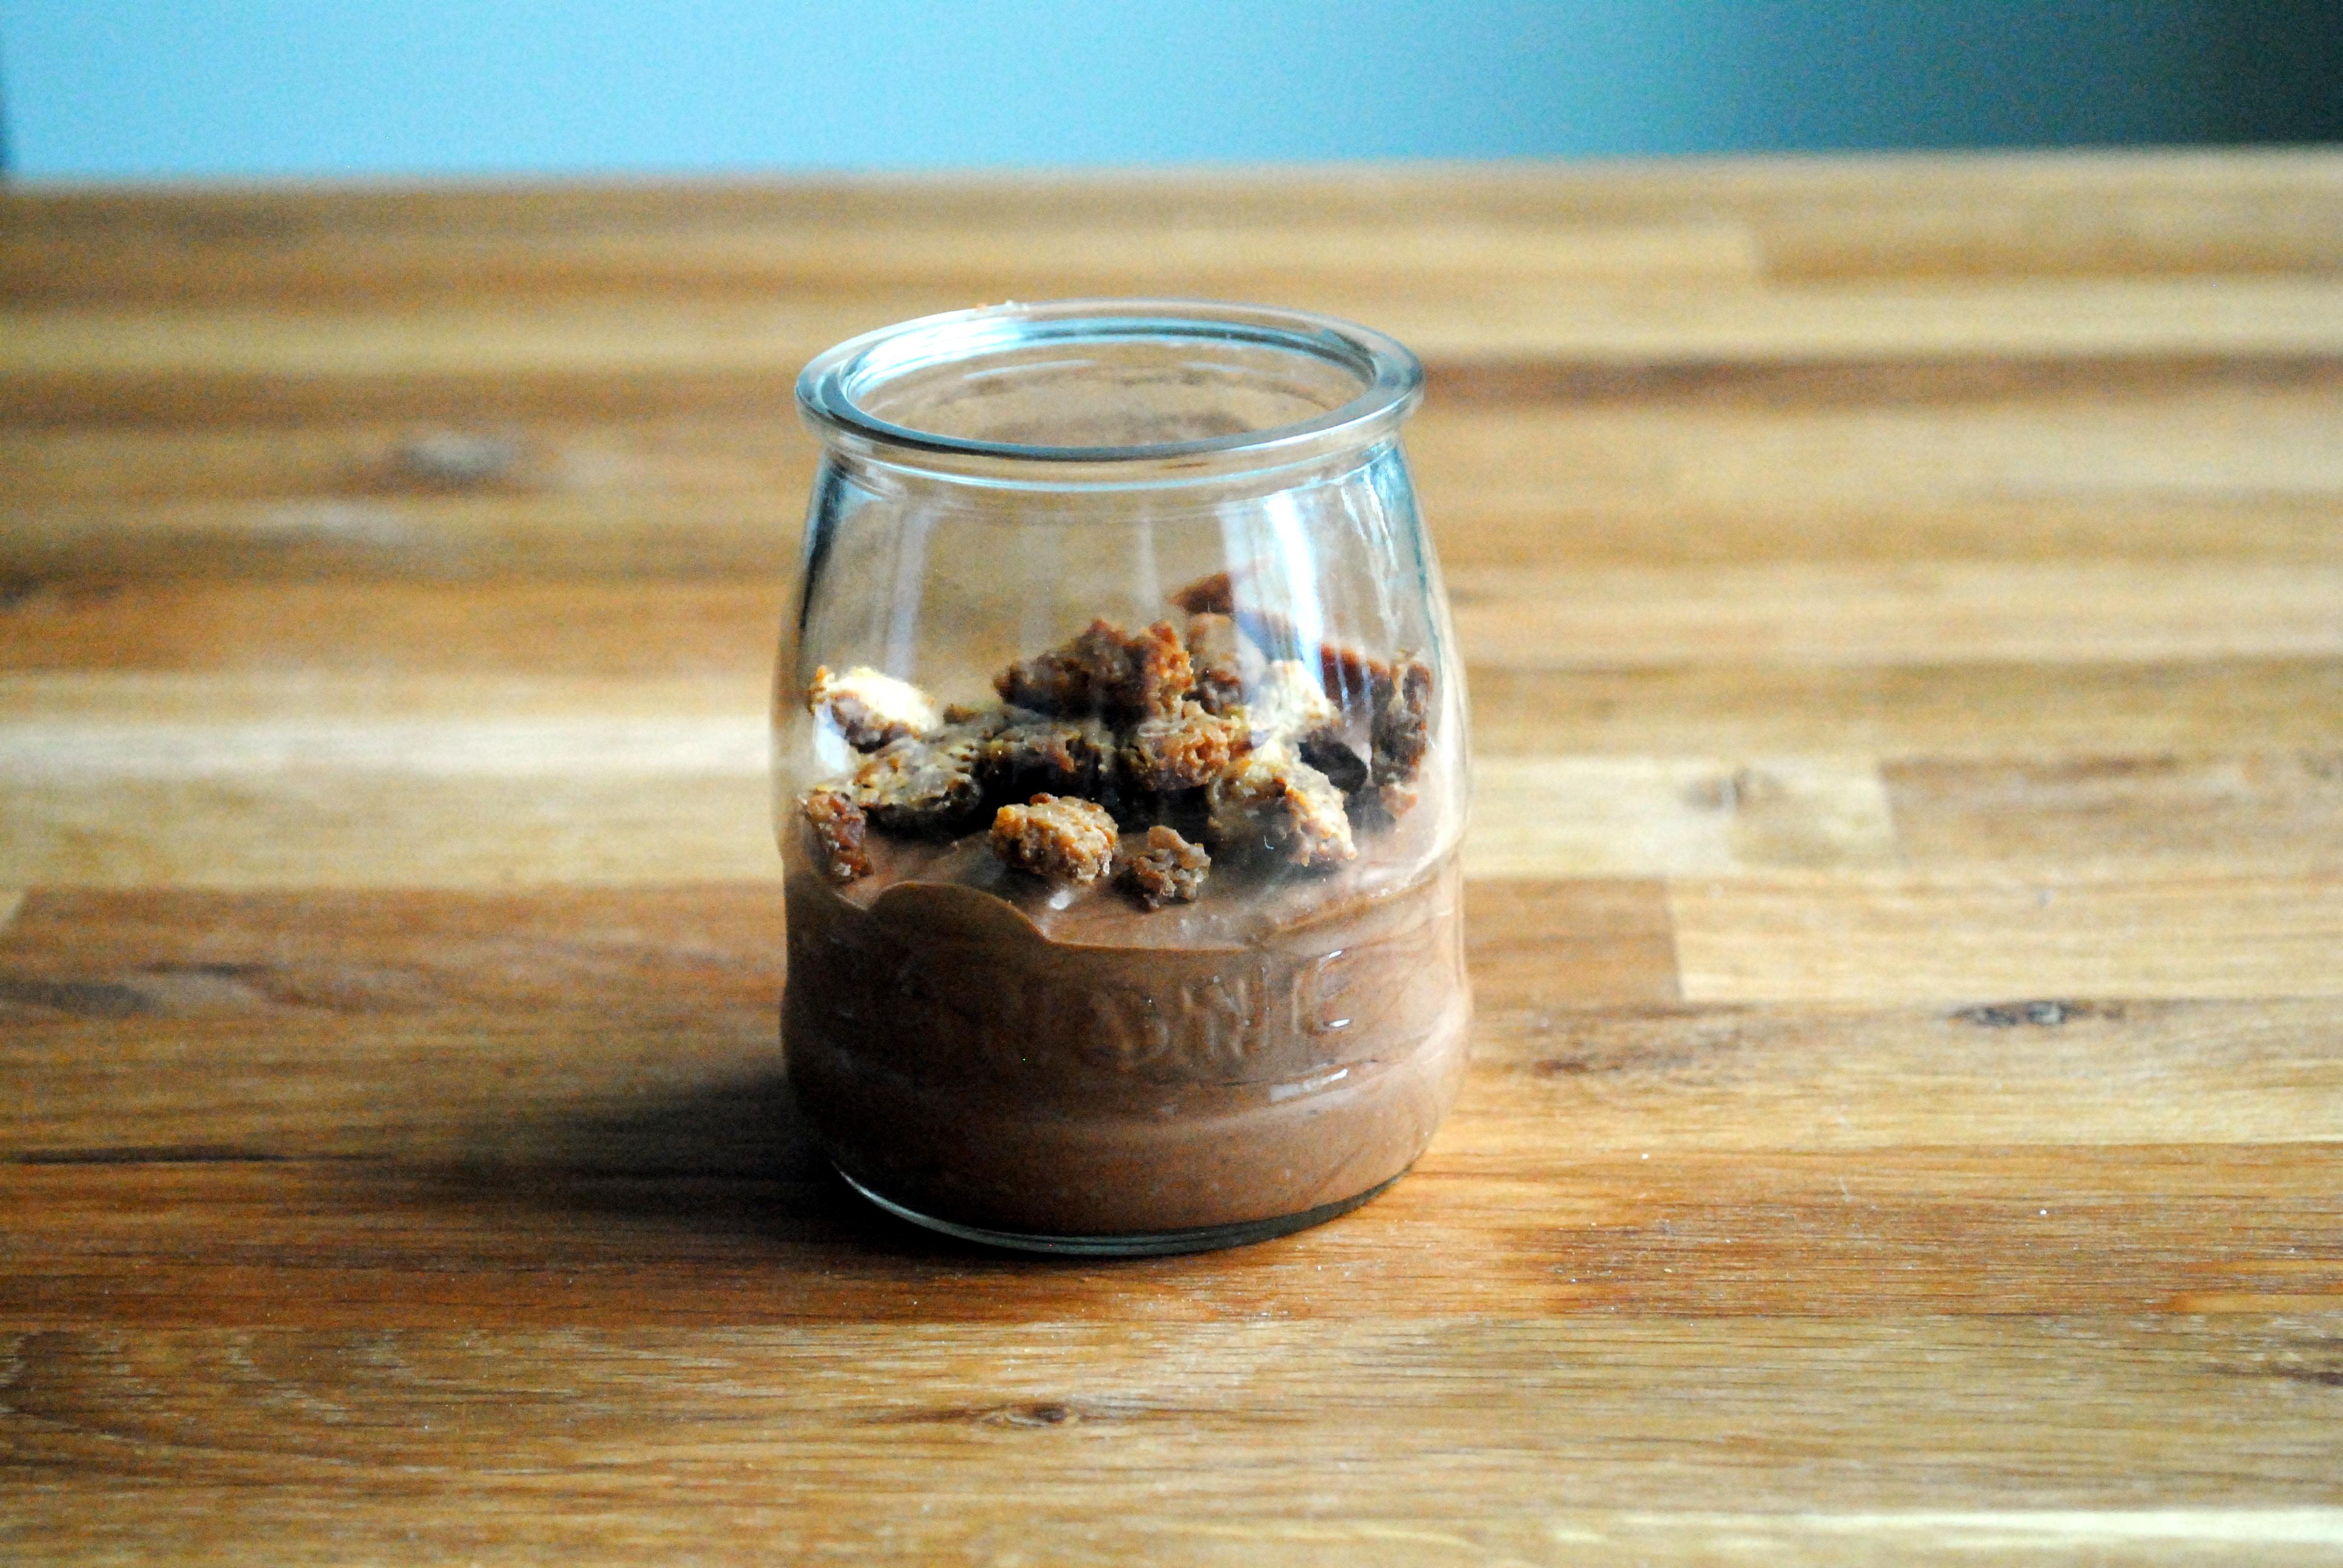 Årets sidste dessert – chokolademousse à la Valrhona